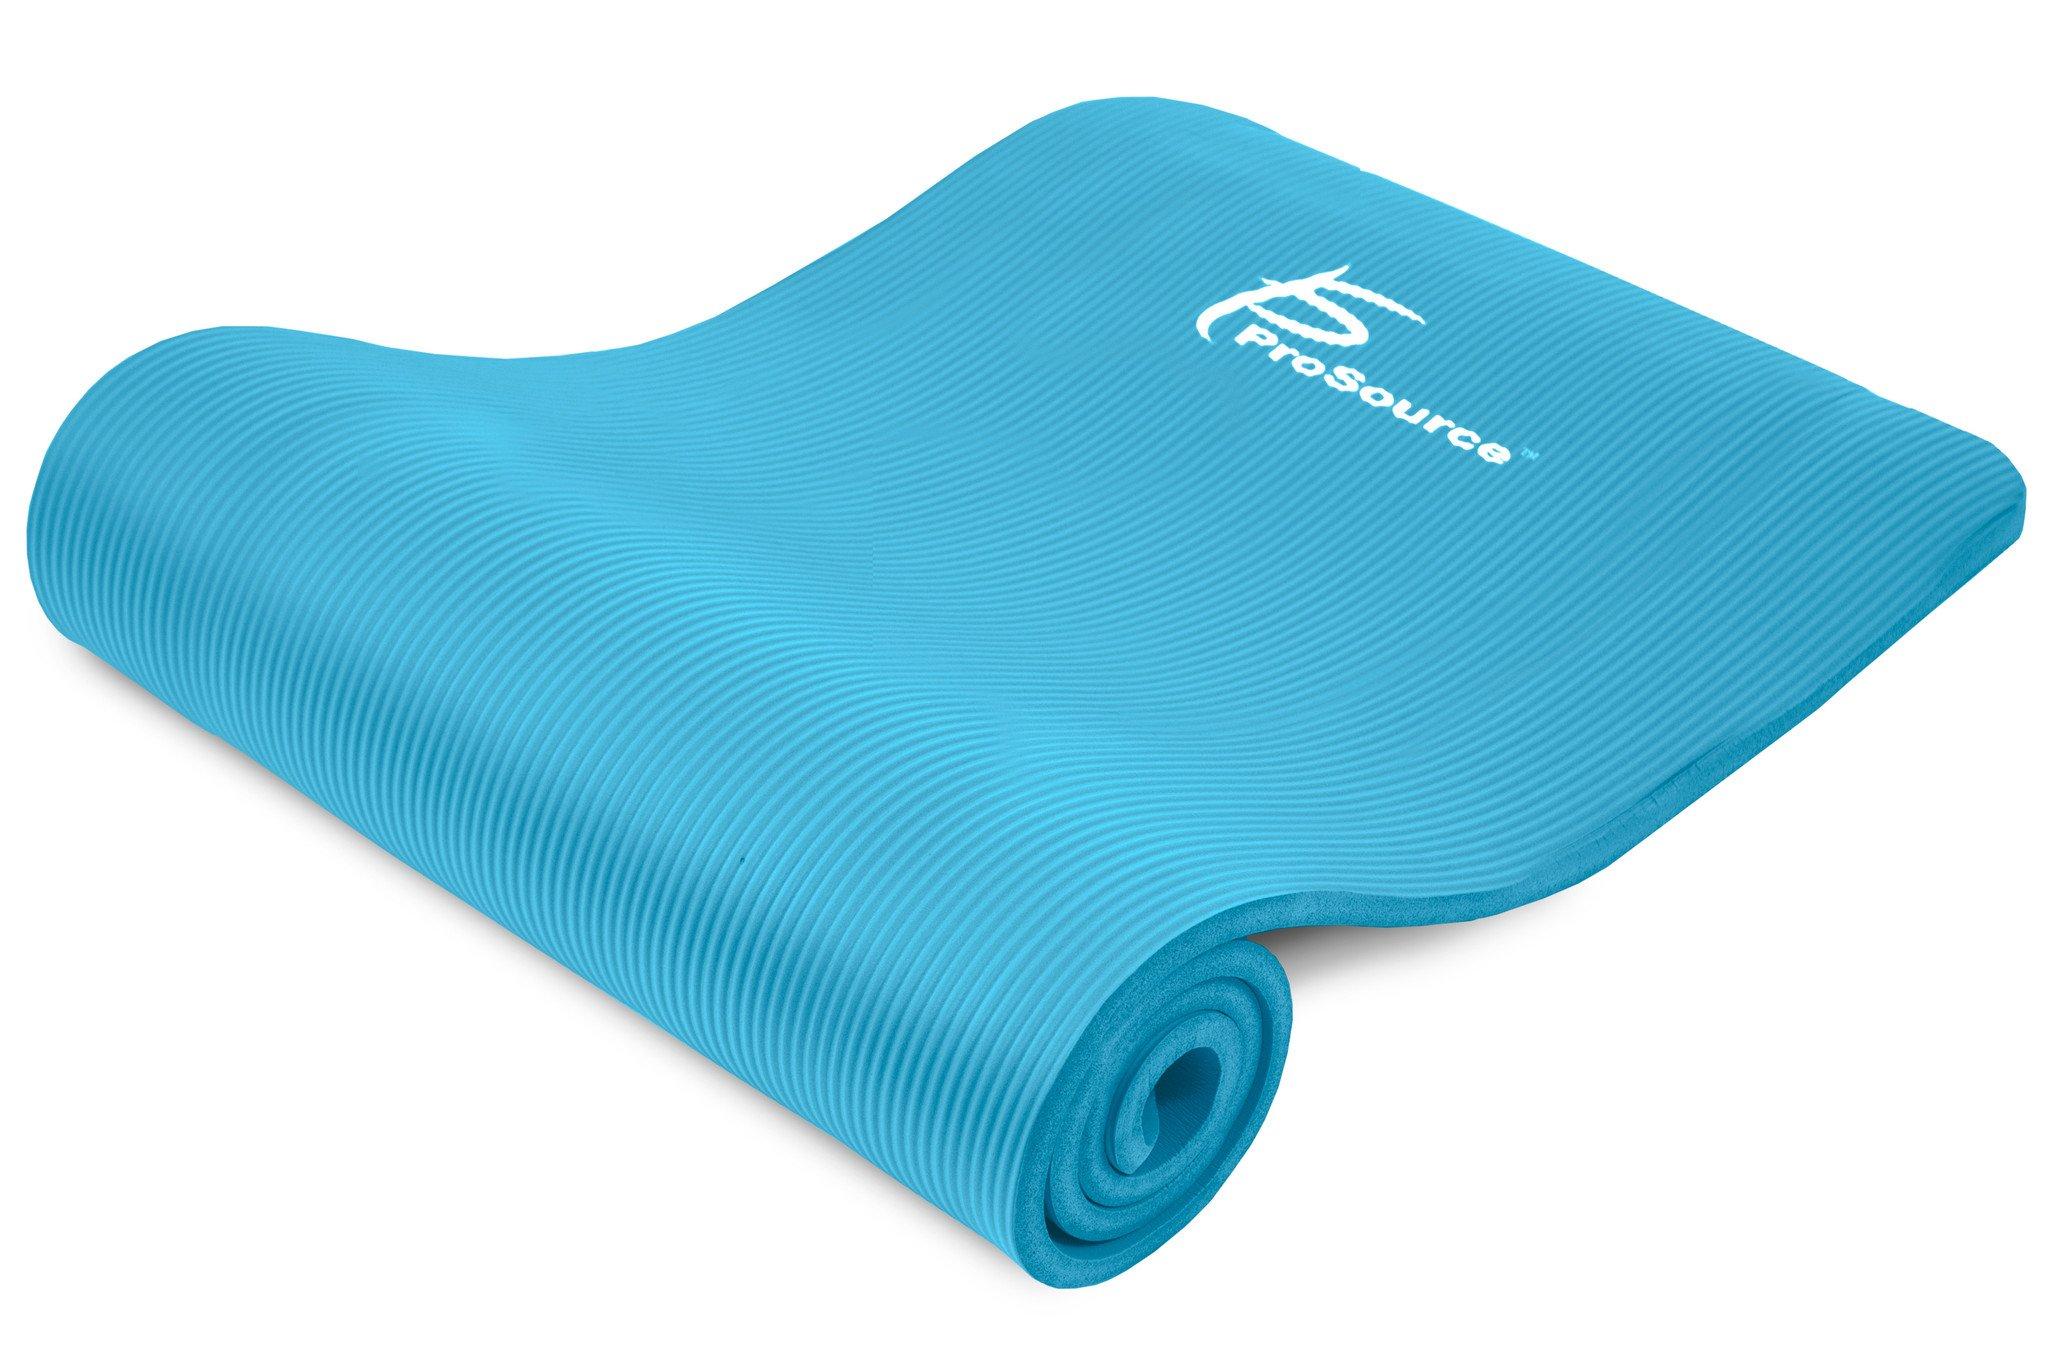 Коврики: Коврик Prosource Extra Thick Yoga Pilates Aqua